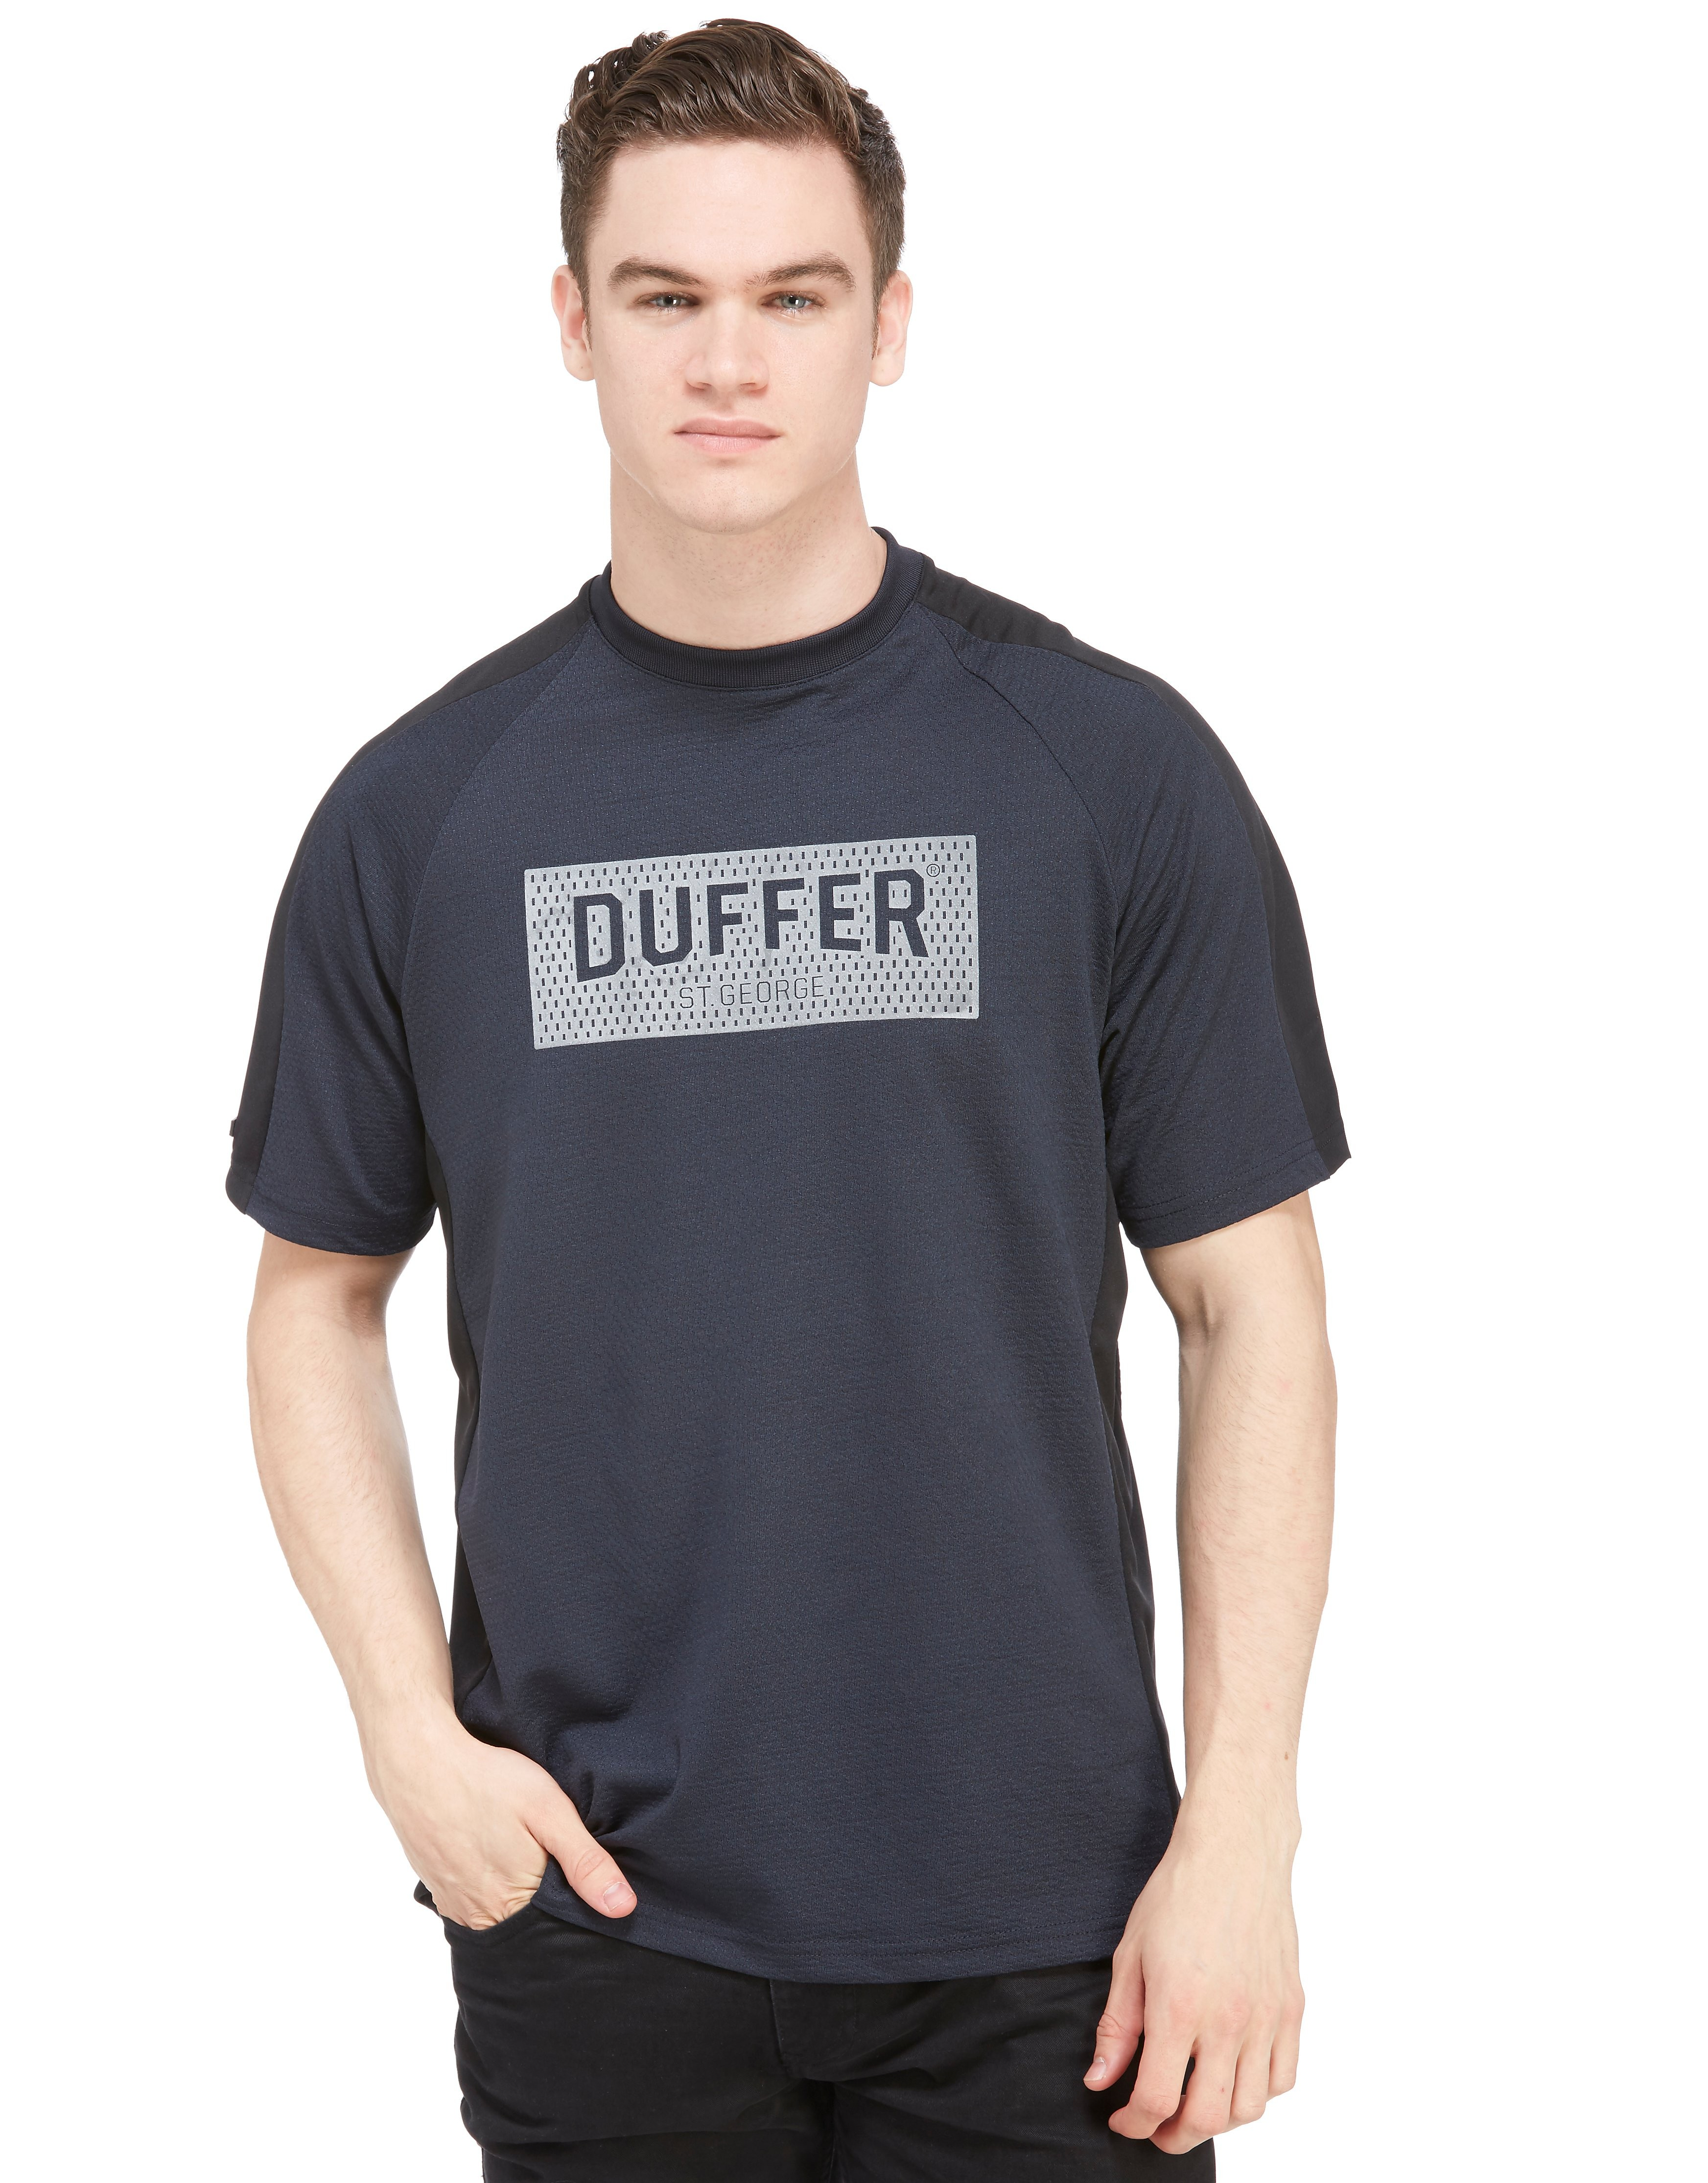 Duffer of St George Essence T-Shirt